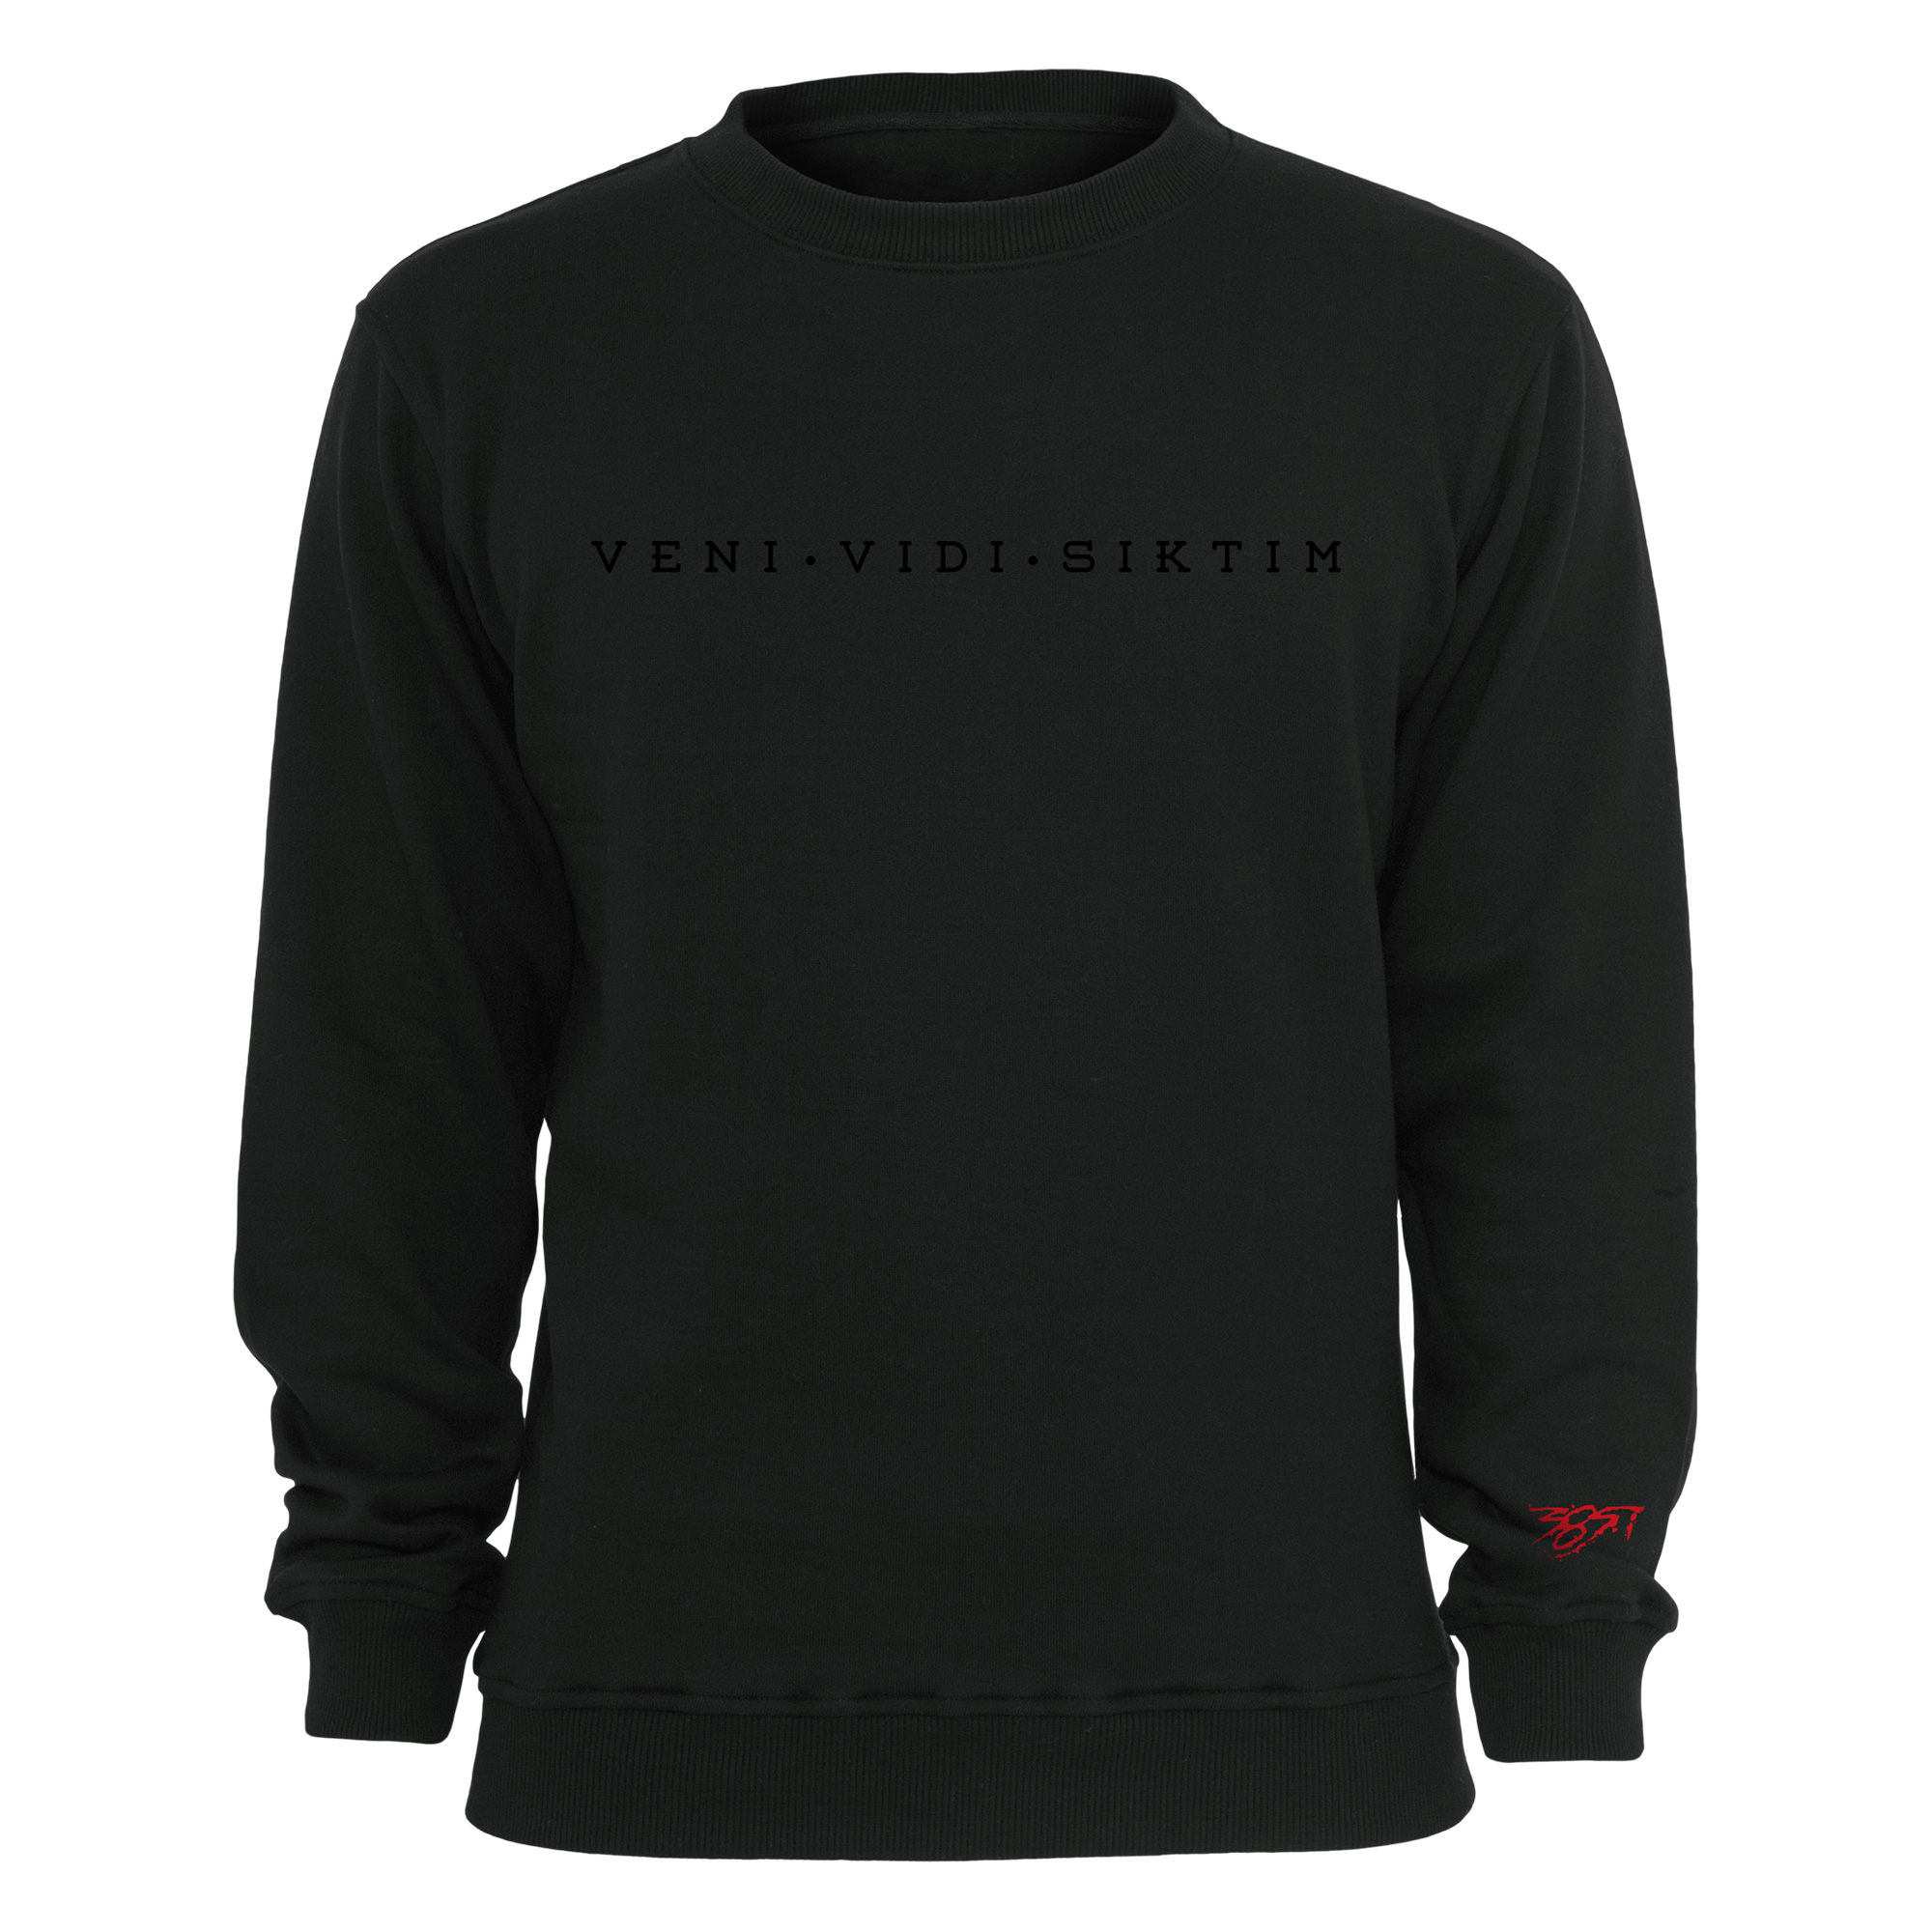 Veni Vidi Siktim - Black on Black von Nimo - Sweater jetzt im Bravado Shop